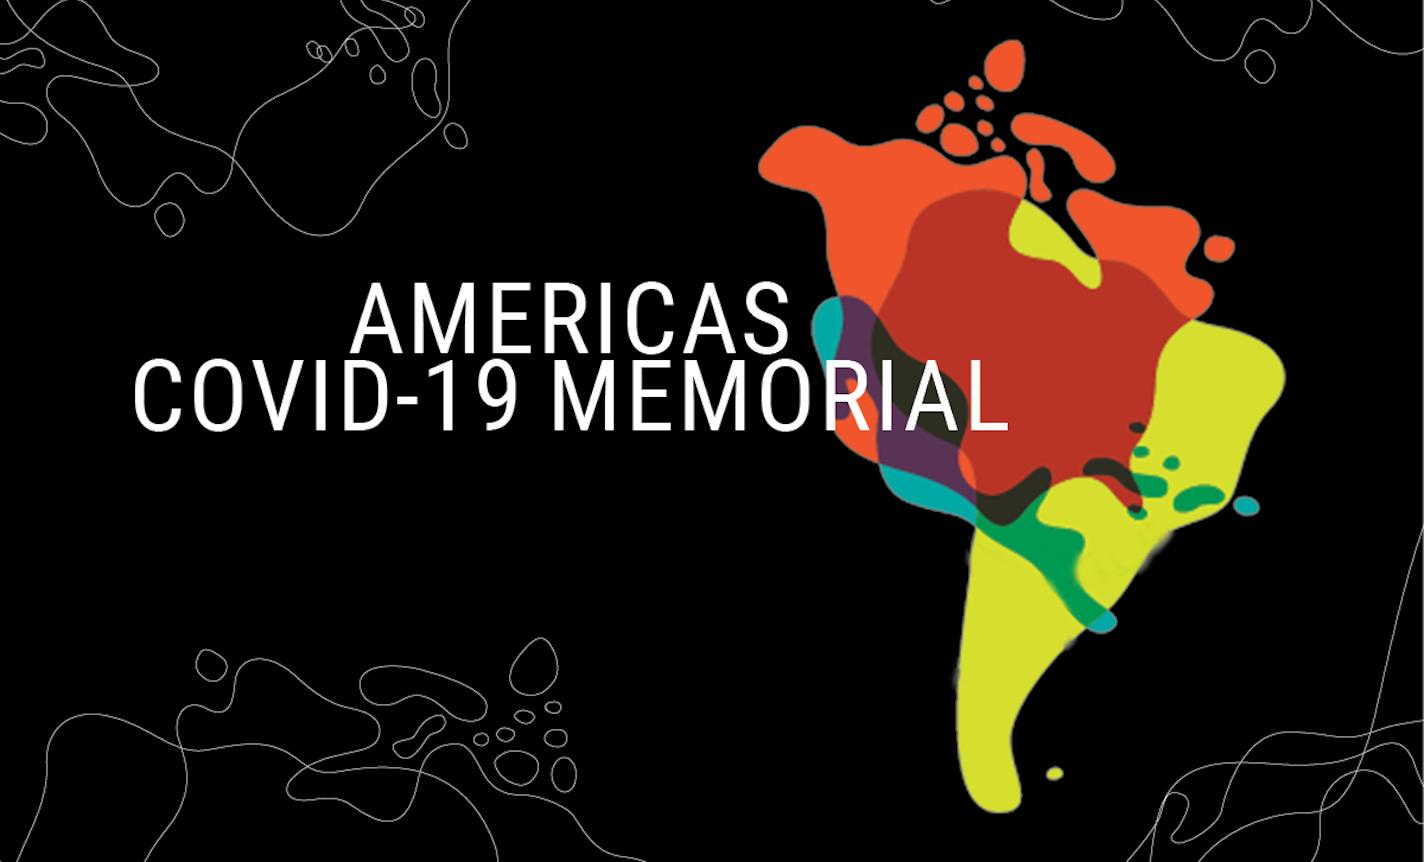 Biennial Coffee Chat: Public Memorials & Social Memory